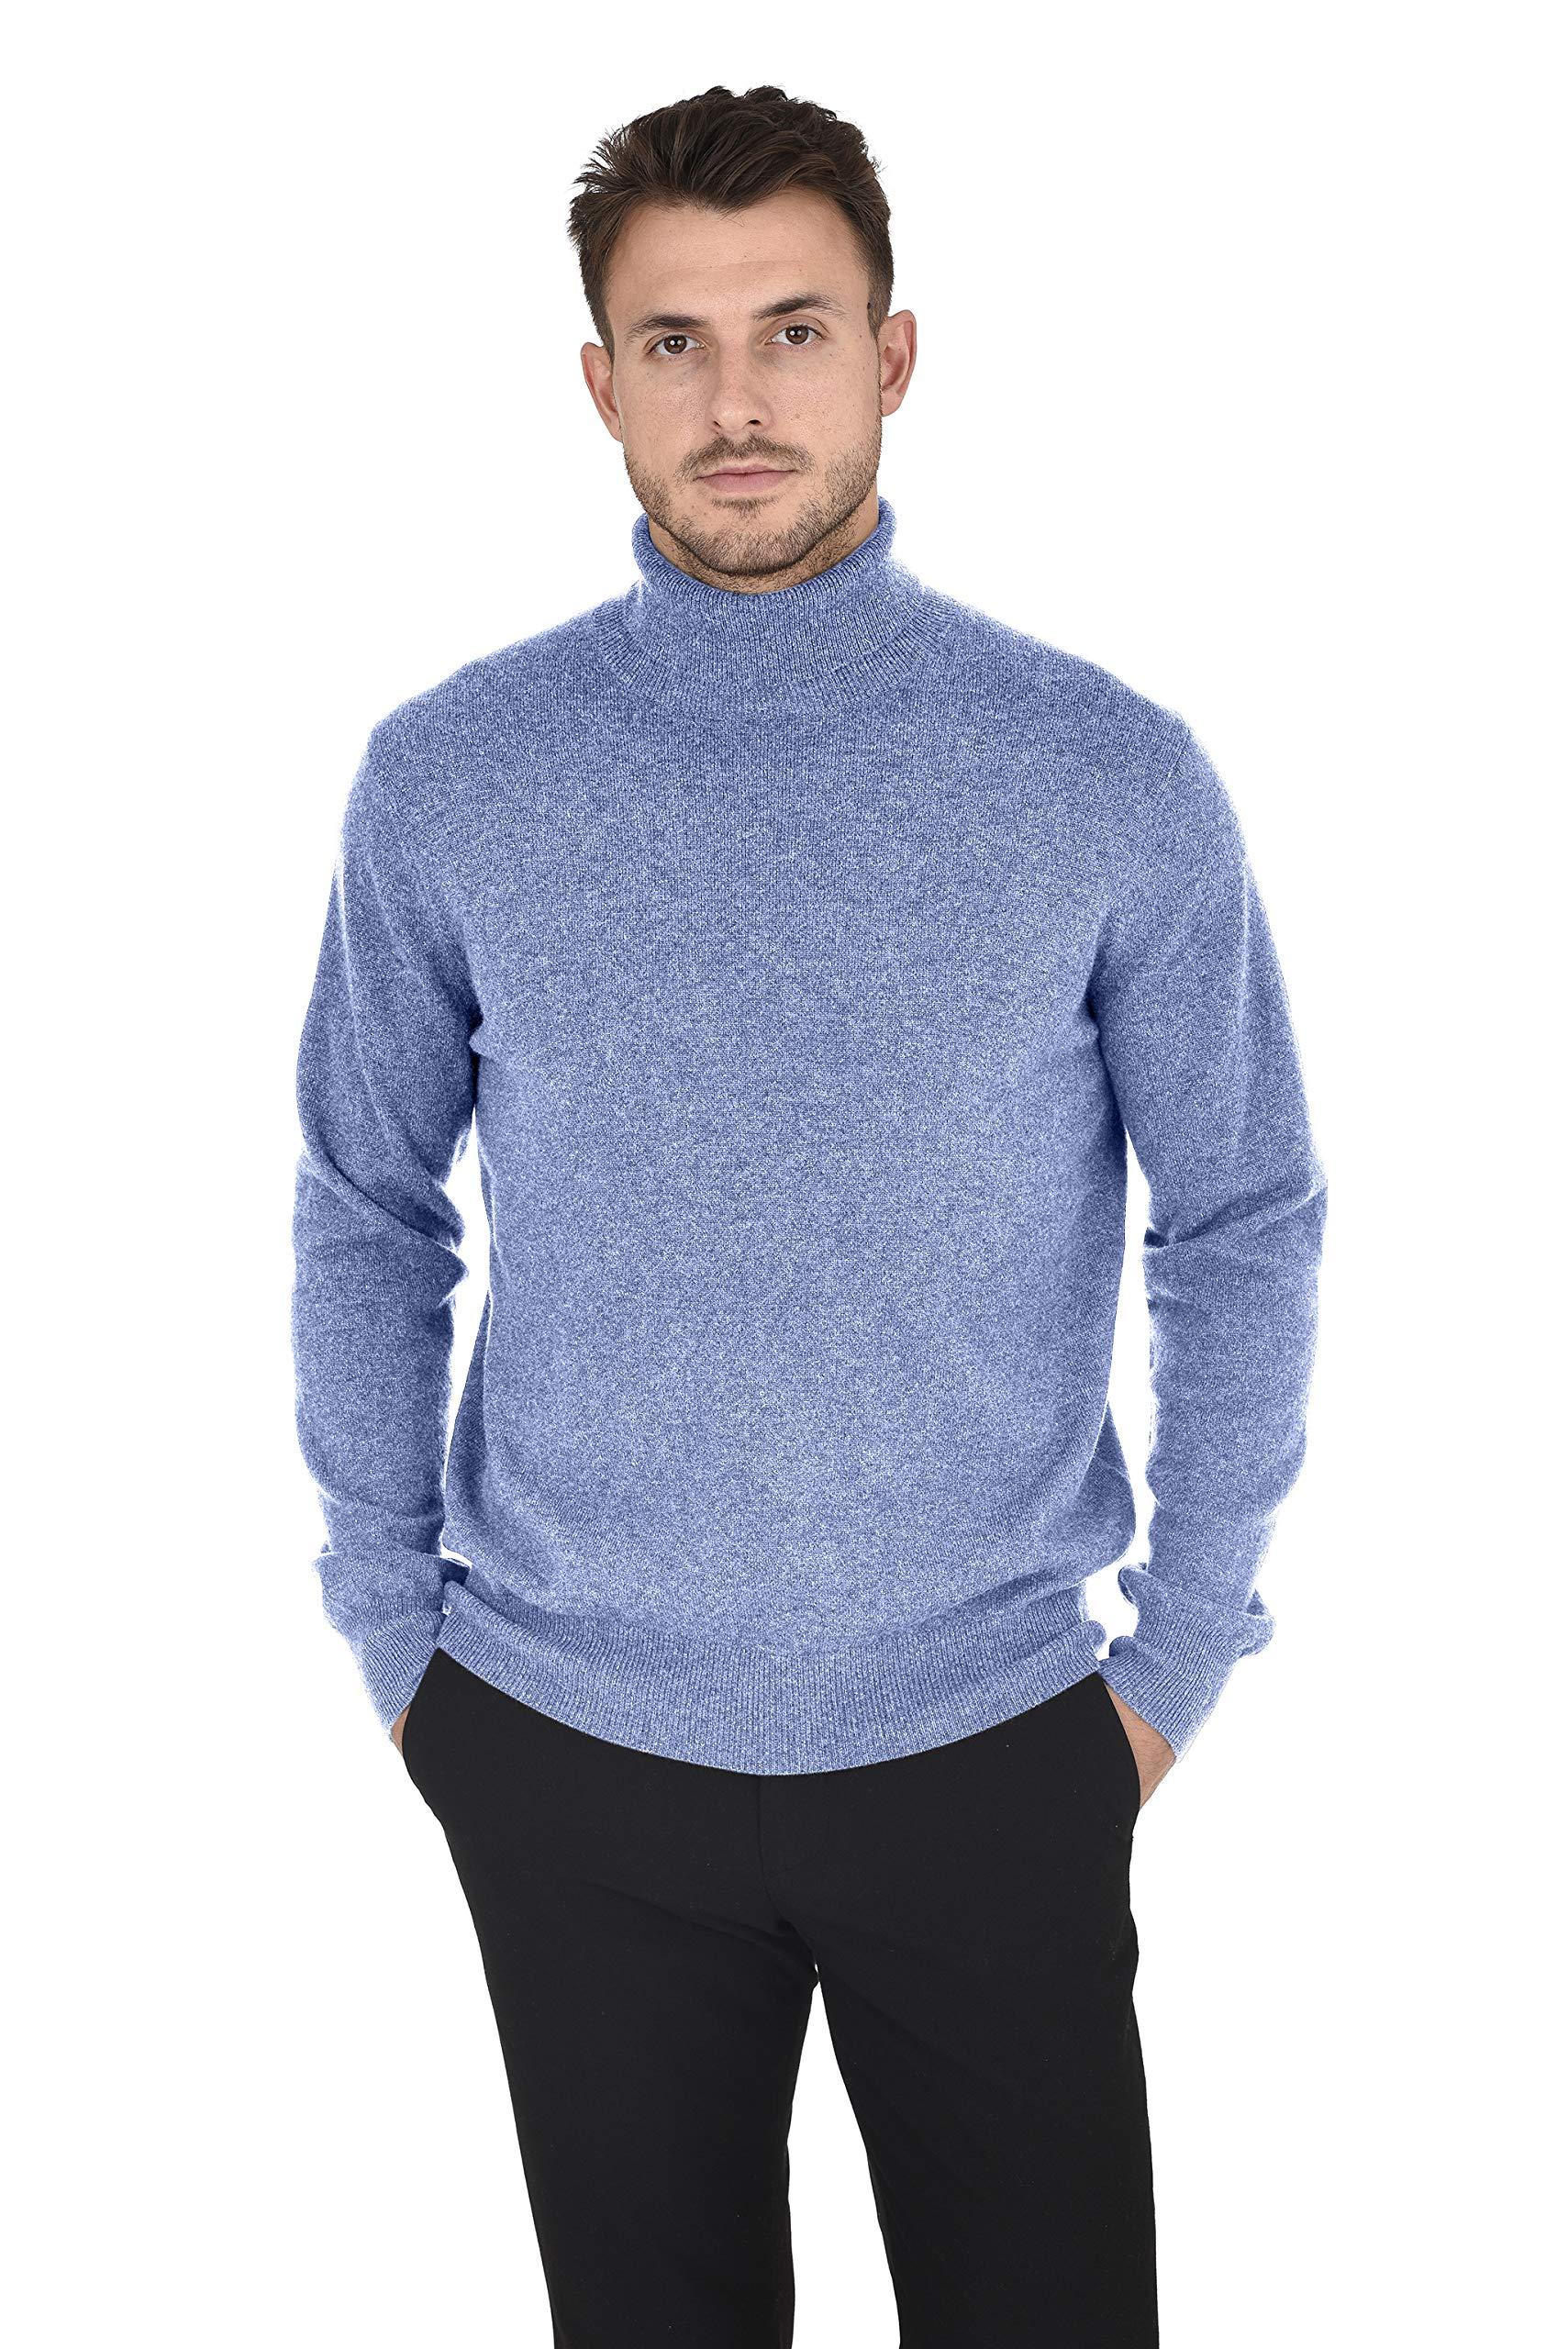 Cashmeren Men's Wool Cashmere Classic Knit Soft Long Sleeve Turtleneck Pullover Sweater (Angel Blue, X-Large)